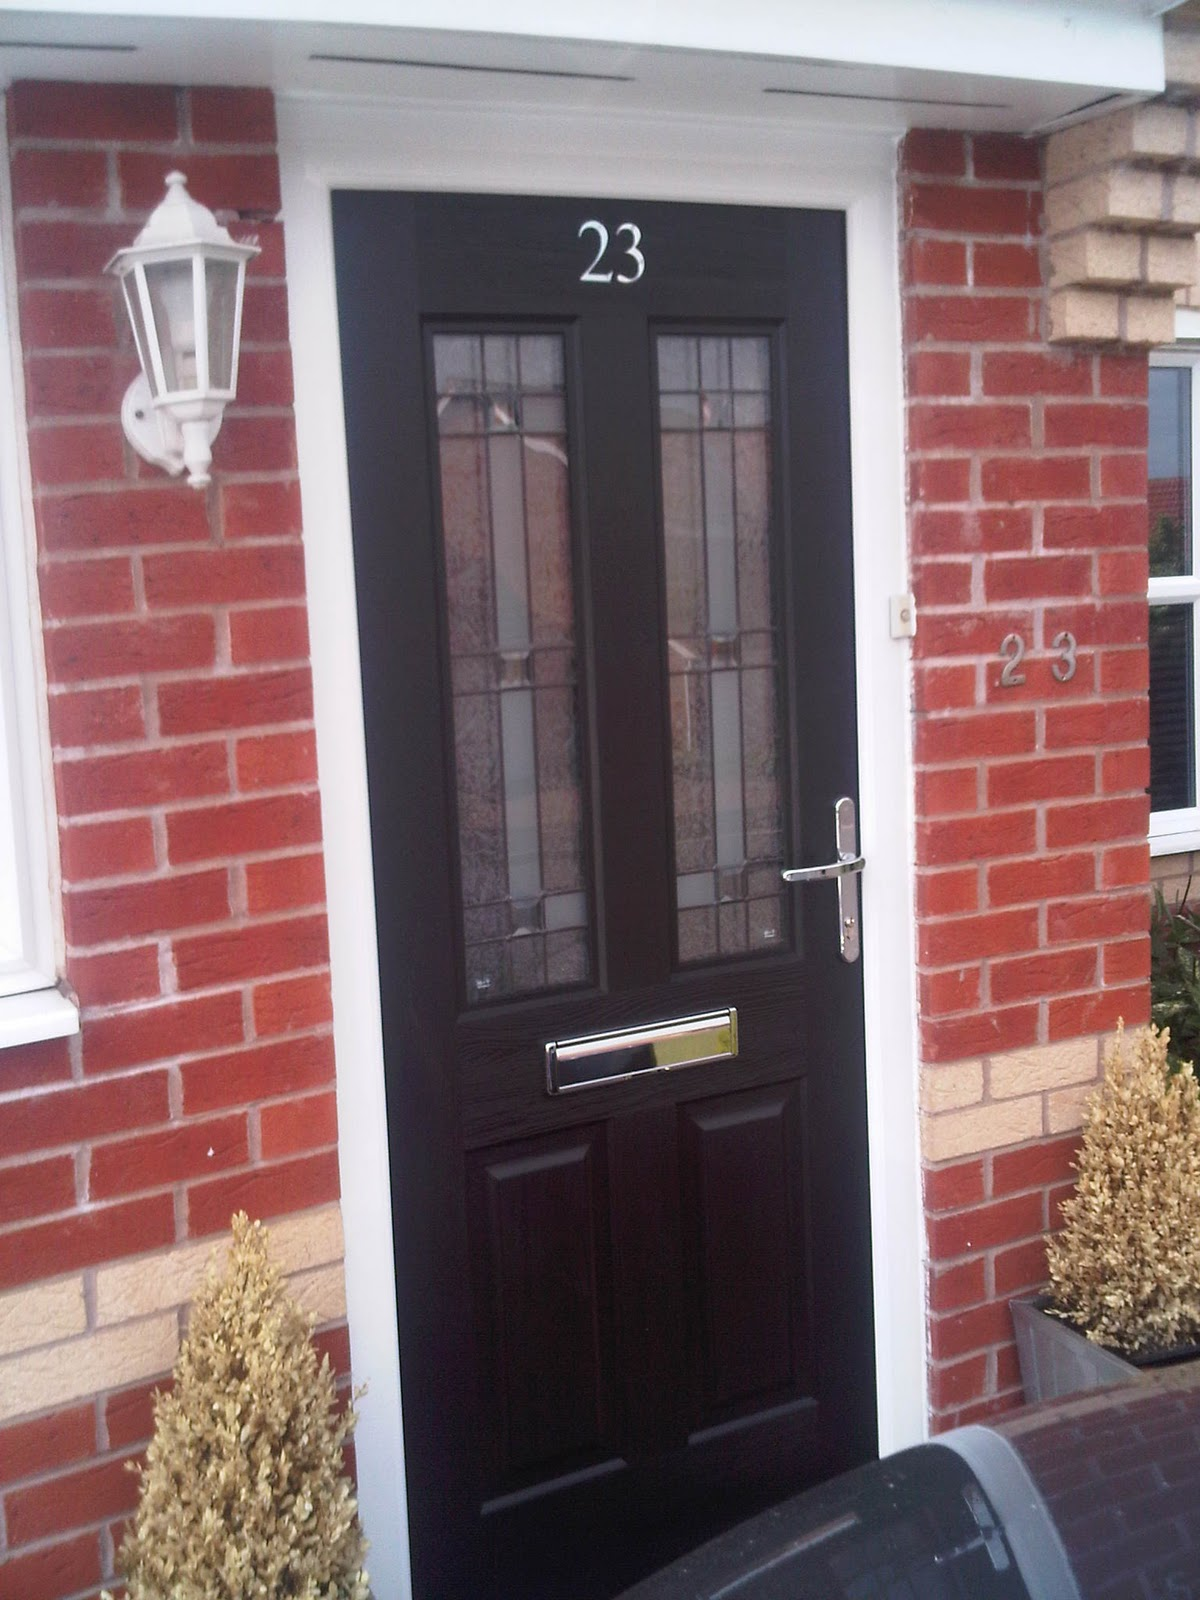 All Our Images Are Upvc Doors Fitted By Us And Not Stock Photo\\\\\\\\\\\\\\\\\\\\\\\\\\\\\\\\u0027s. Image Number 72 Of Door Fitting Birmingham . & Door Fitters Birmingham \u0026 Composite Doors Birmingham Sutton Design . Pezcame.Com